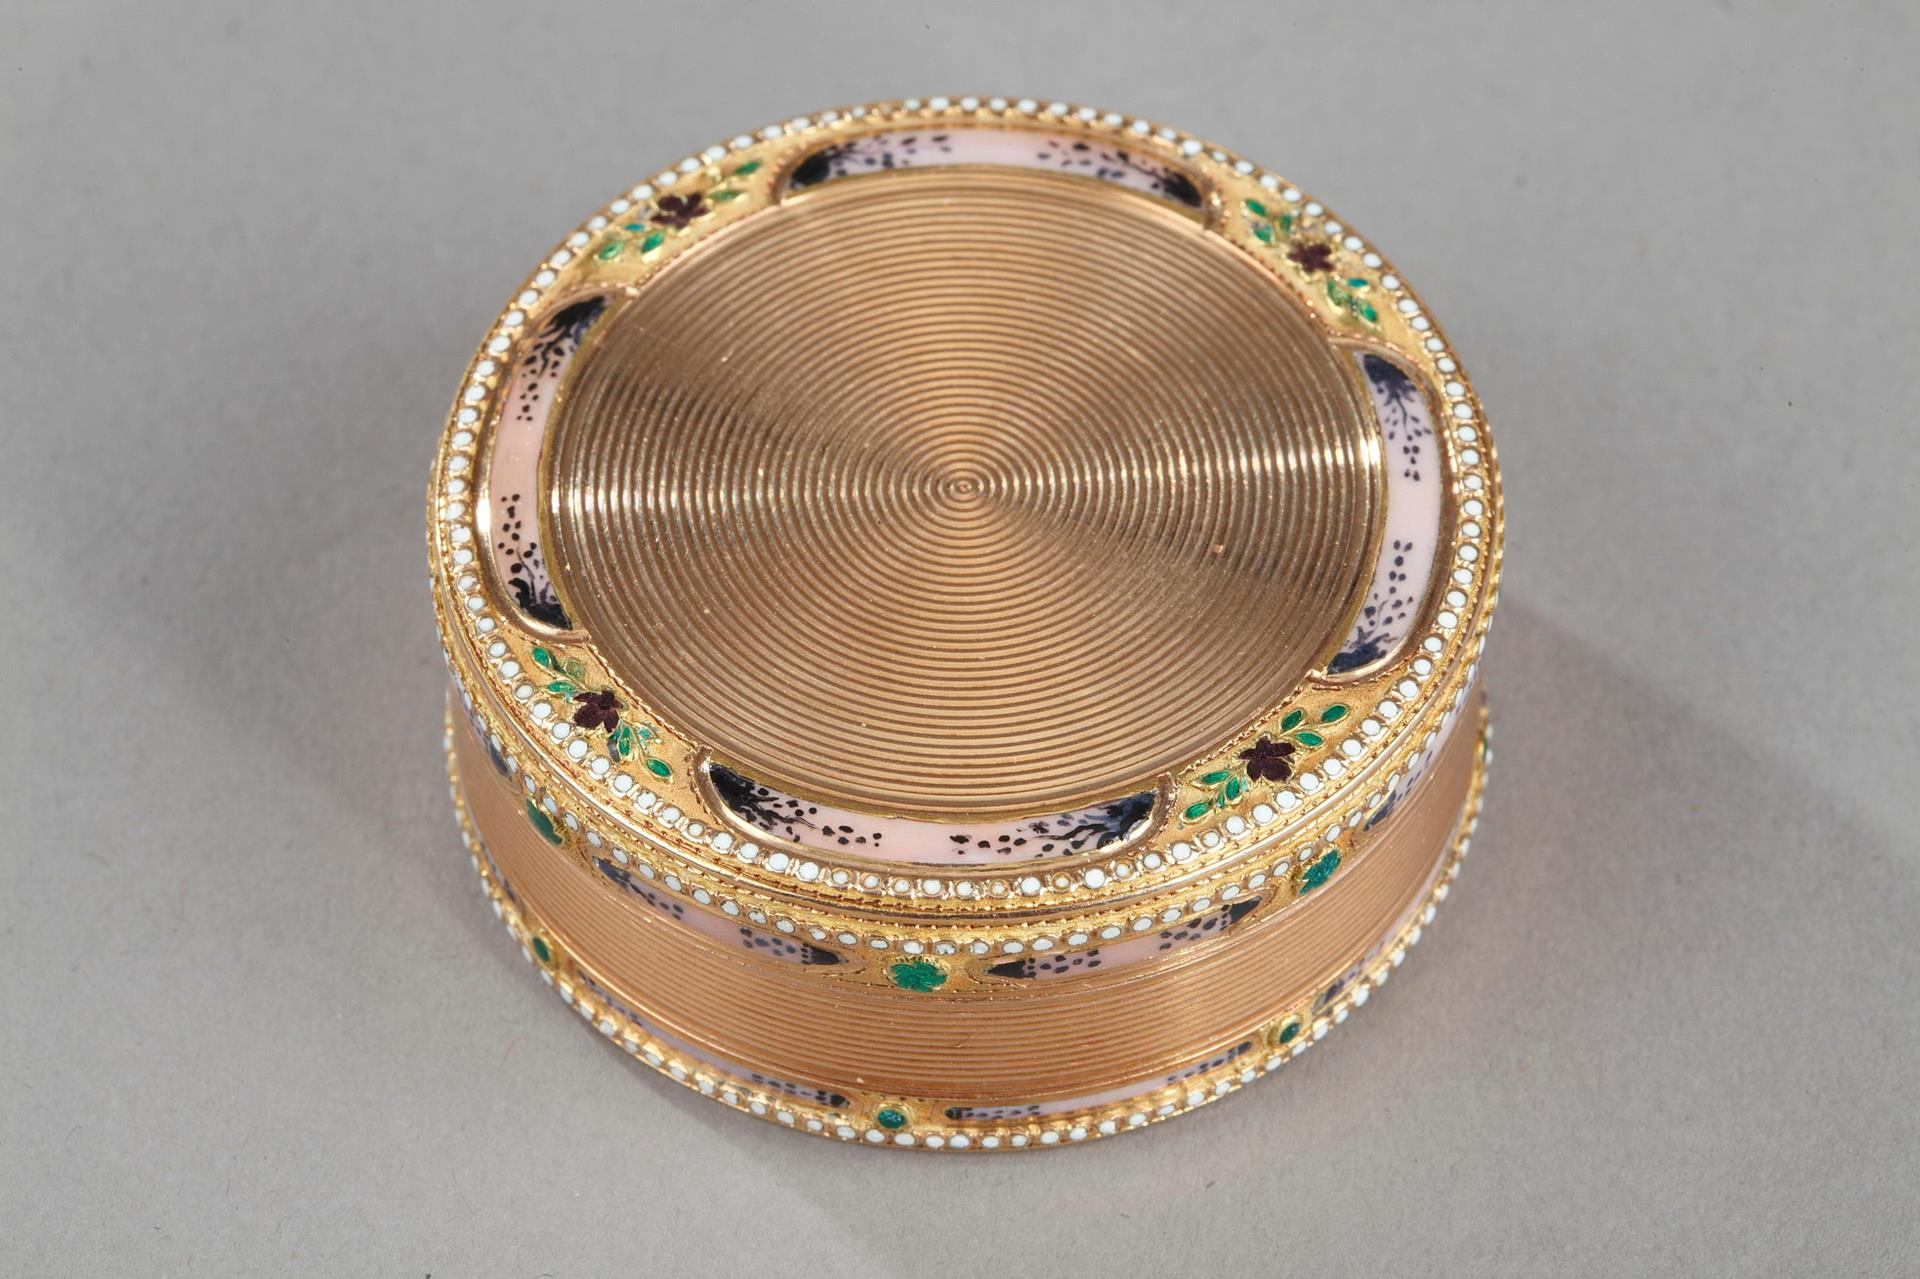 Gold and enamel 18th century circular box.